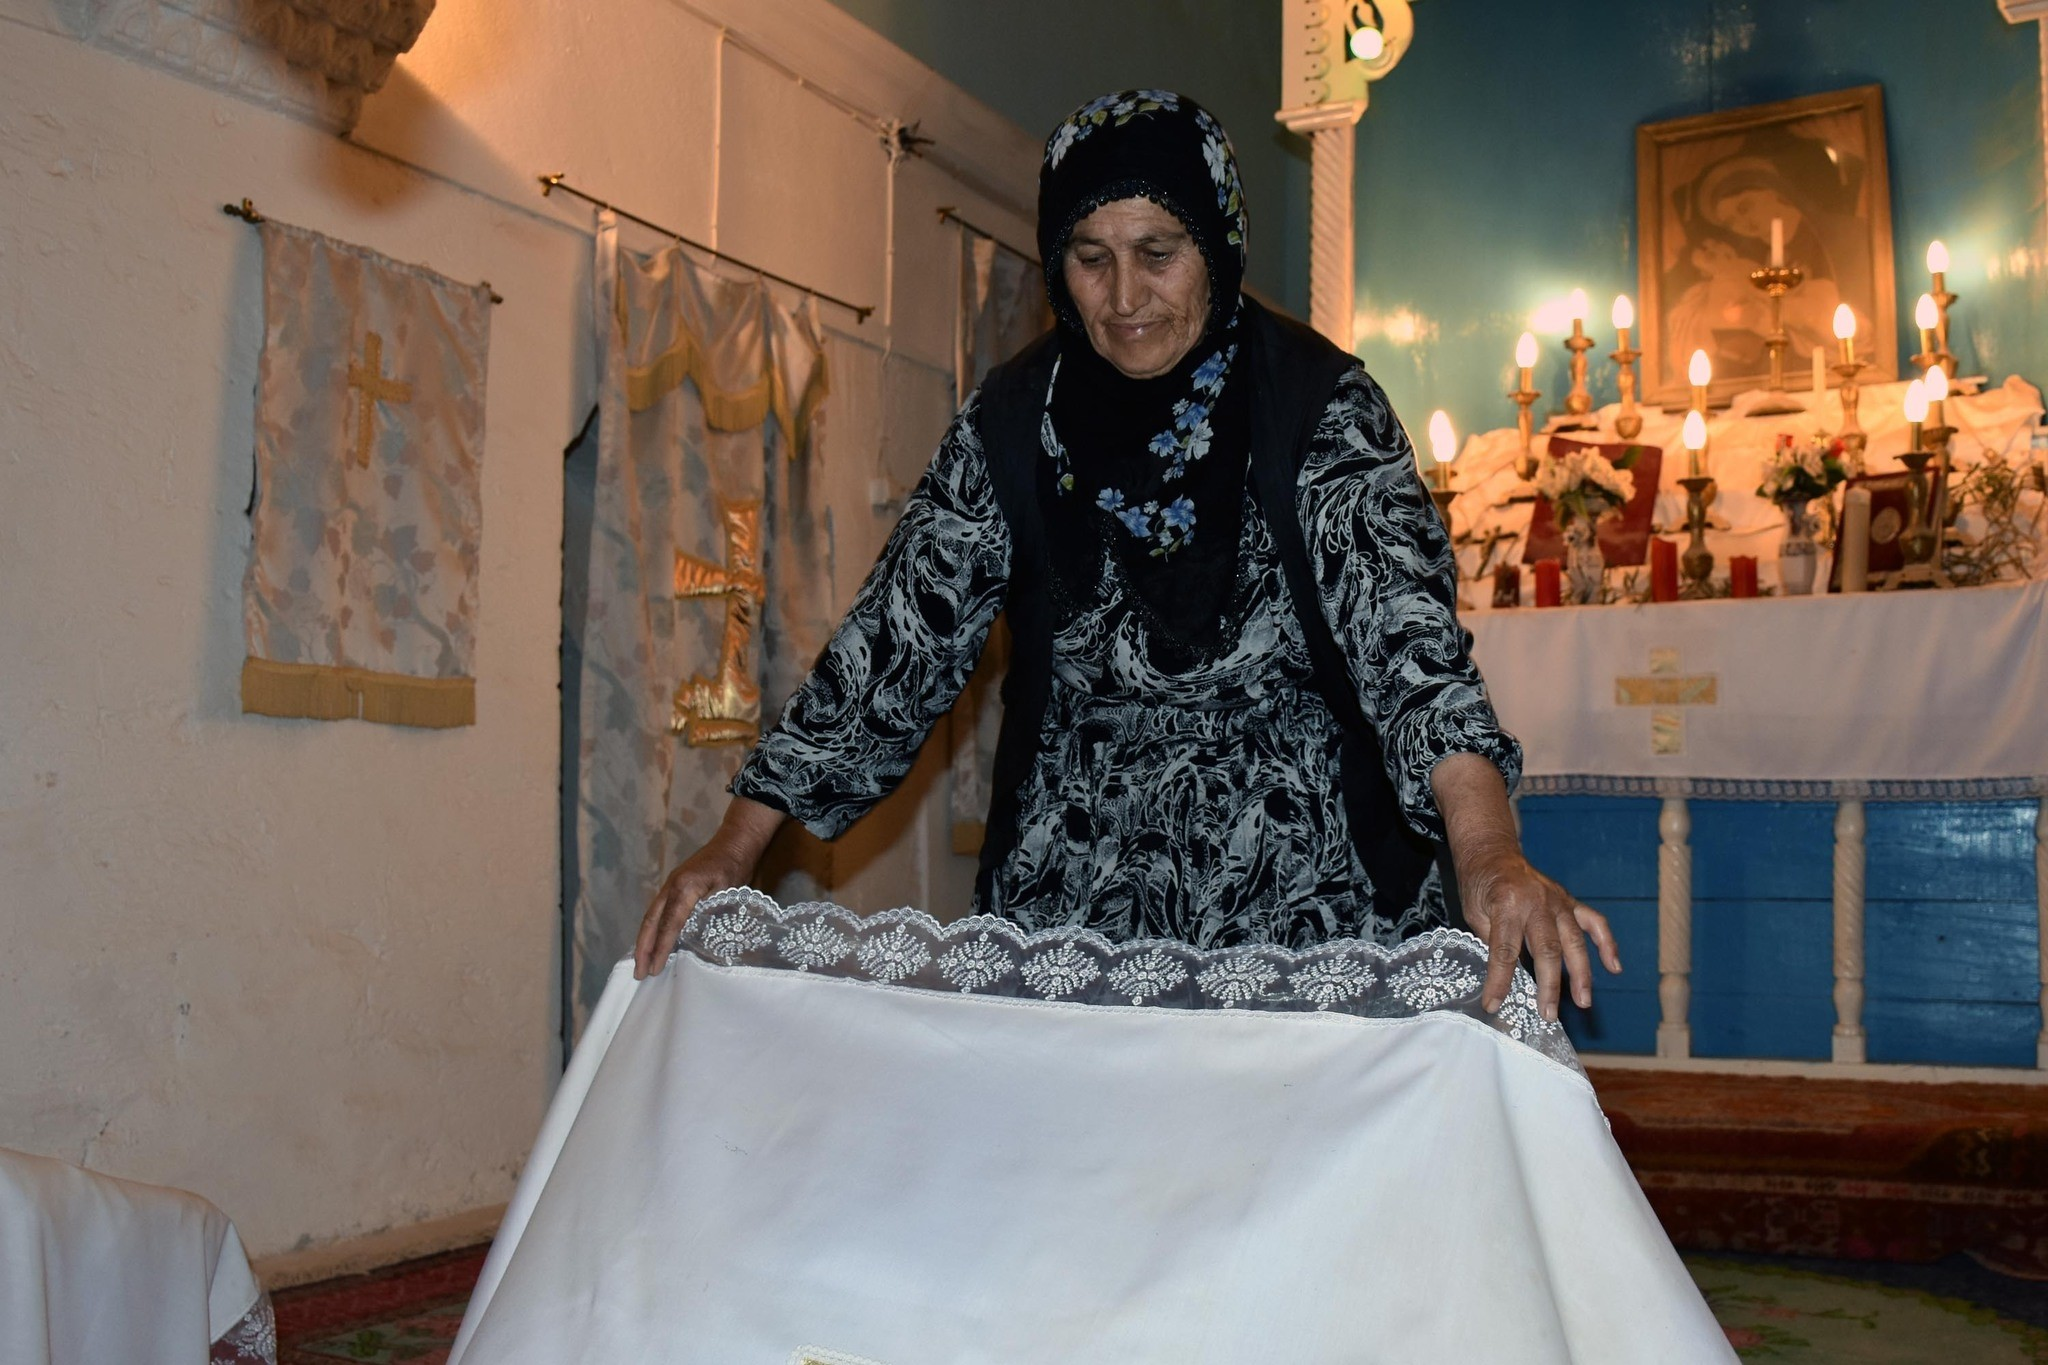 Every day, Hatun u00c7au00e7ur cleans up the church she u201cdidnu2019t want to be abandoned to its fate.u201d